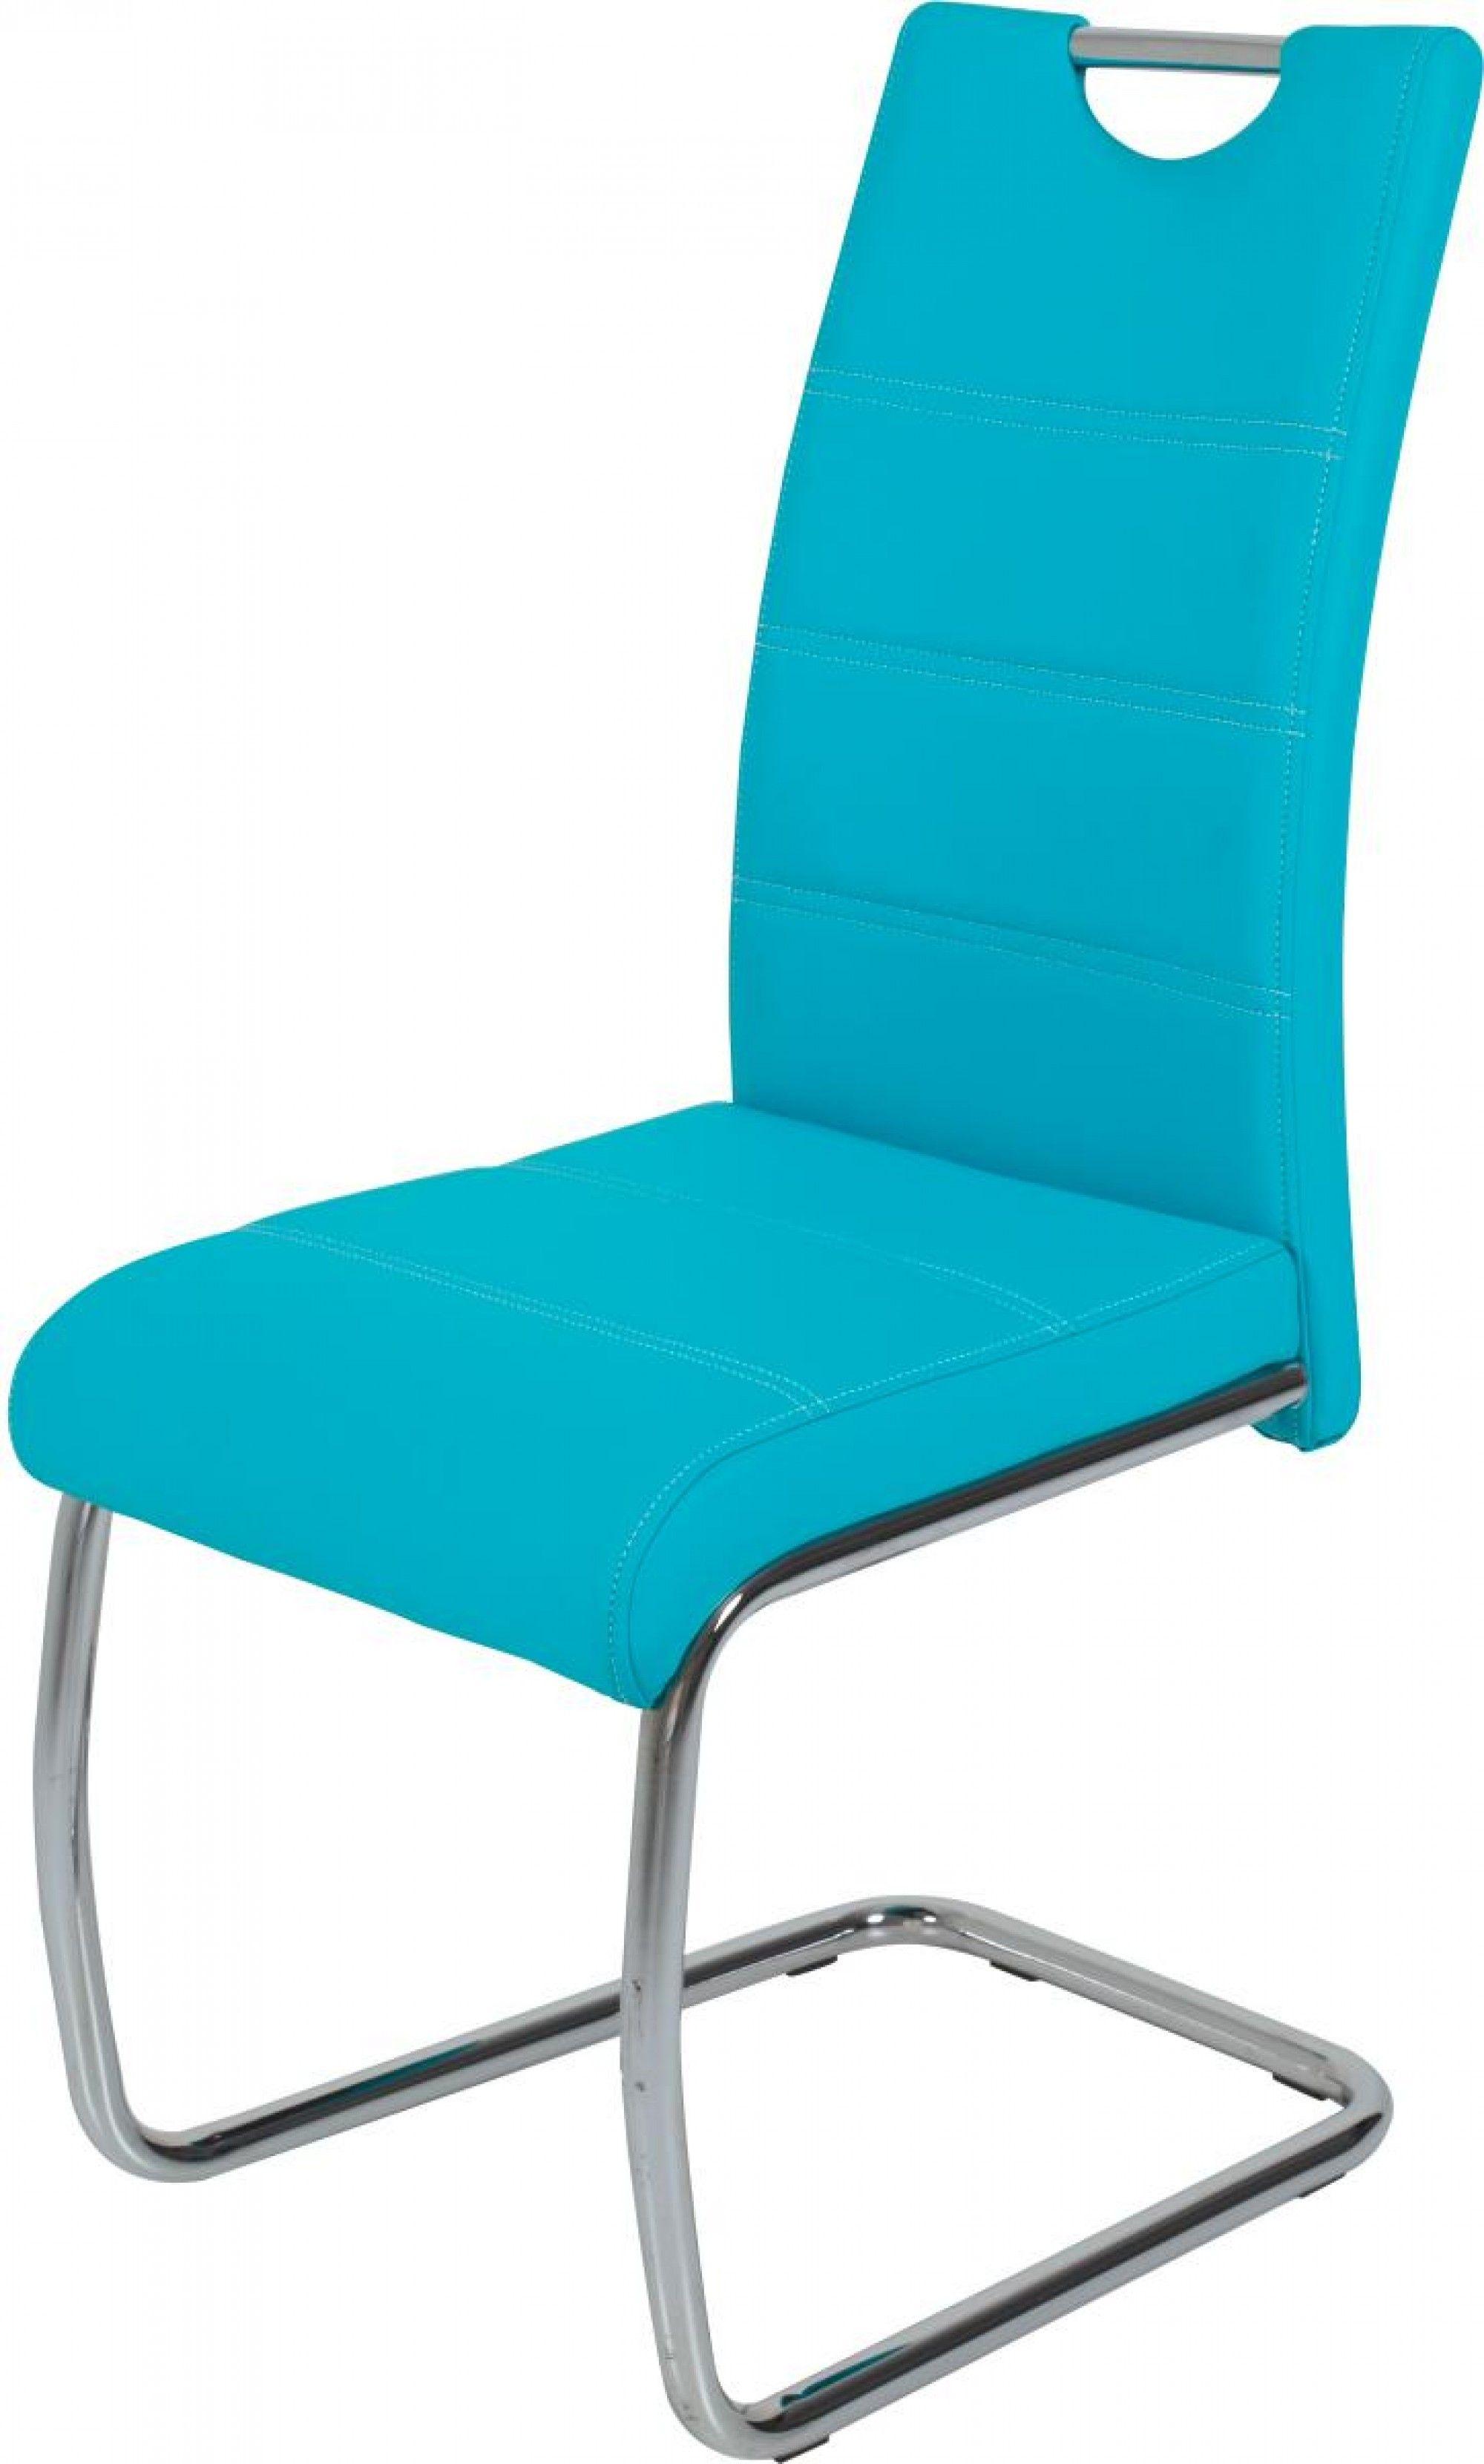 Schwingstuhl Flora Petrol Online Bei Poco Kaufen Freischwinger Stuhle Lederstuhle